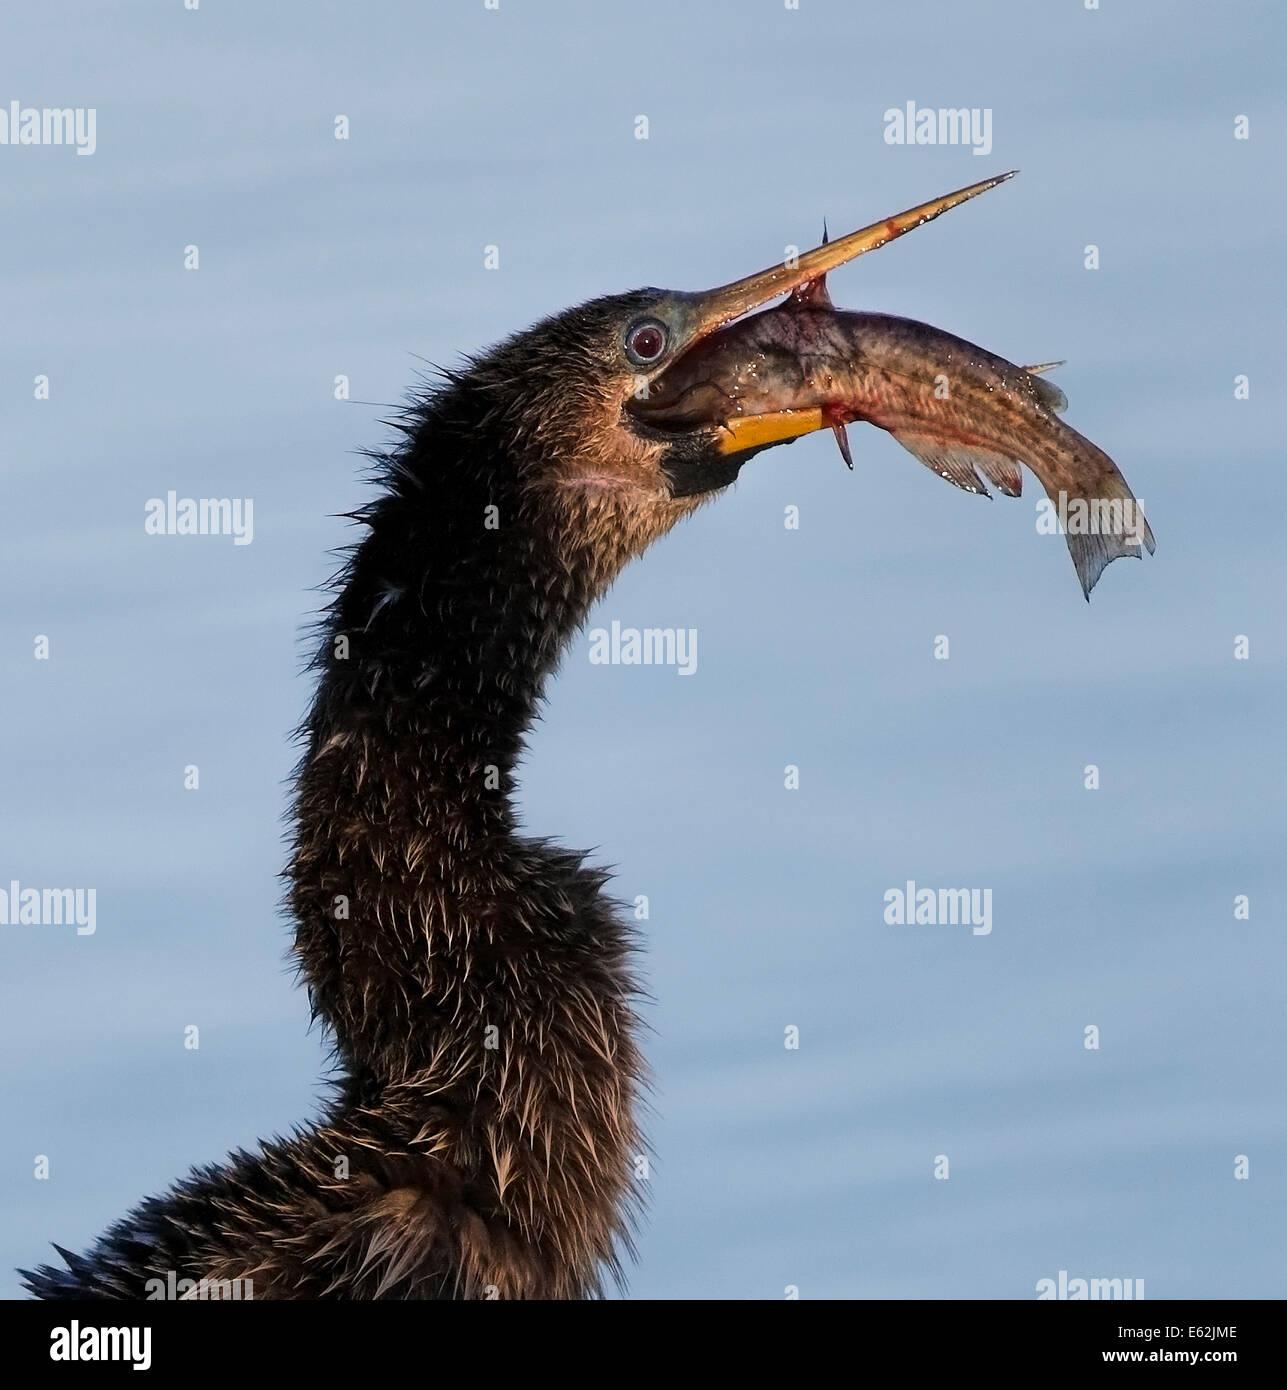 Anhinga (Anhinga anhinga) swallowing a fish in evening light - Stock Image